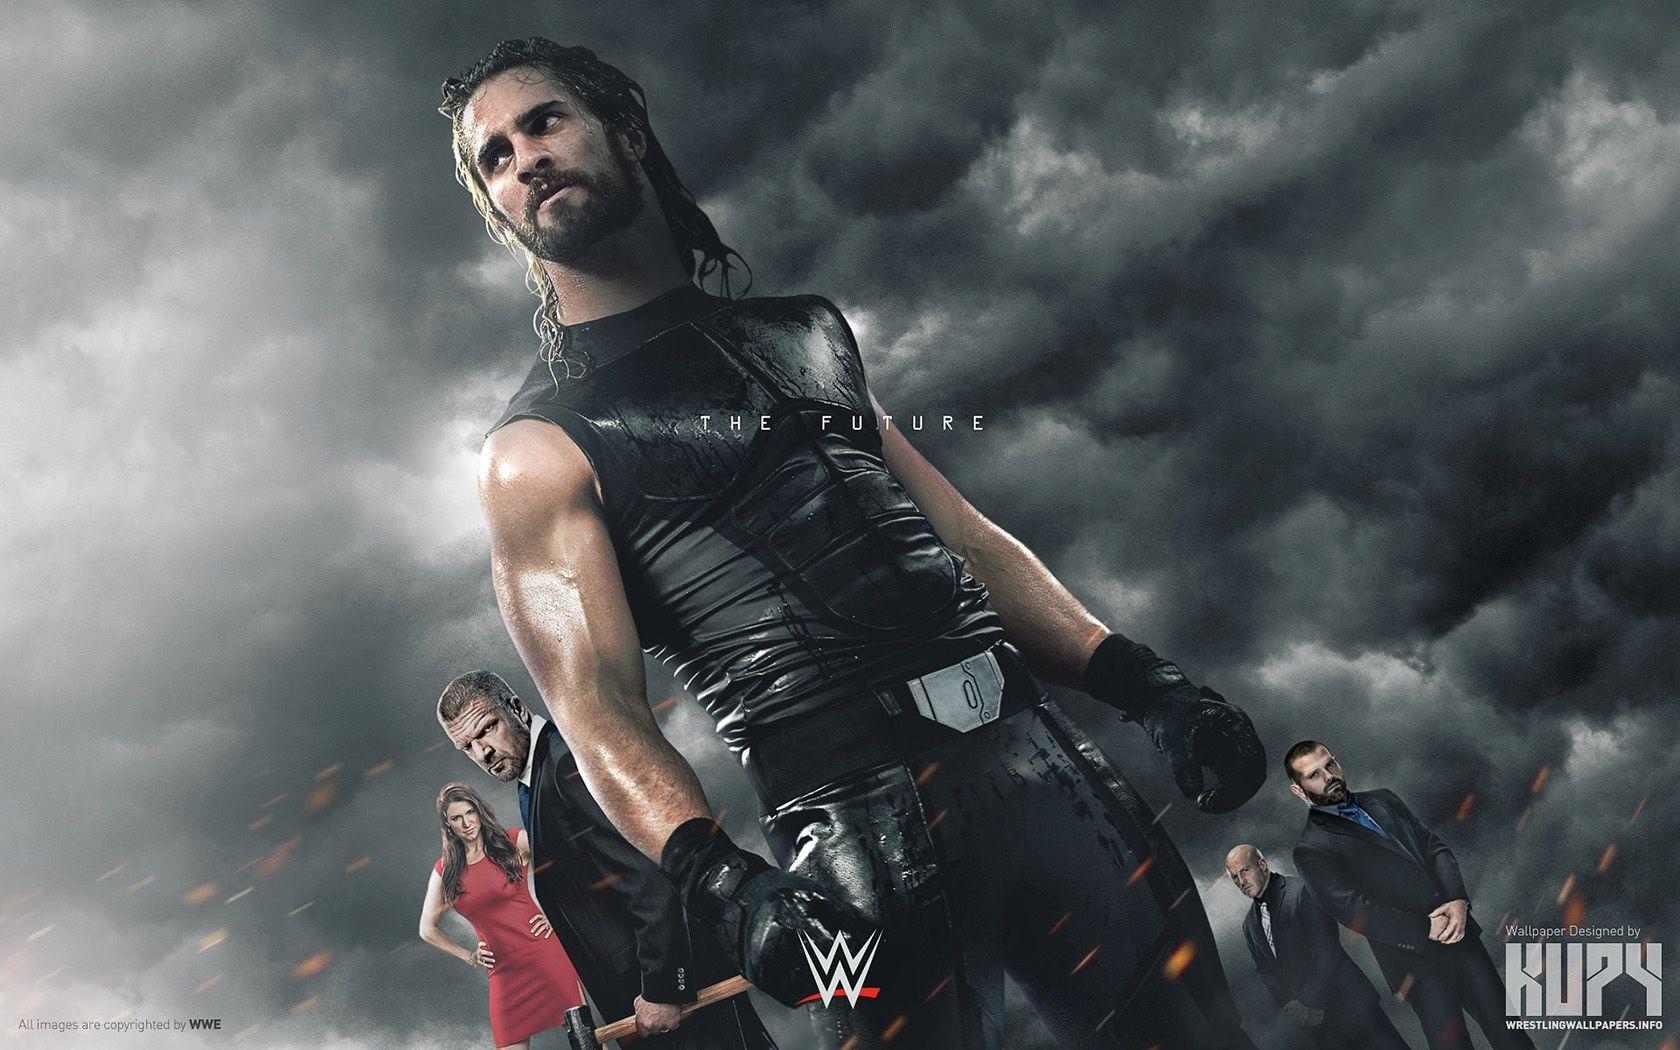 WWE Raw Superstars 2015 Wallpapers 1680x1050